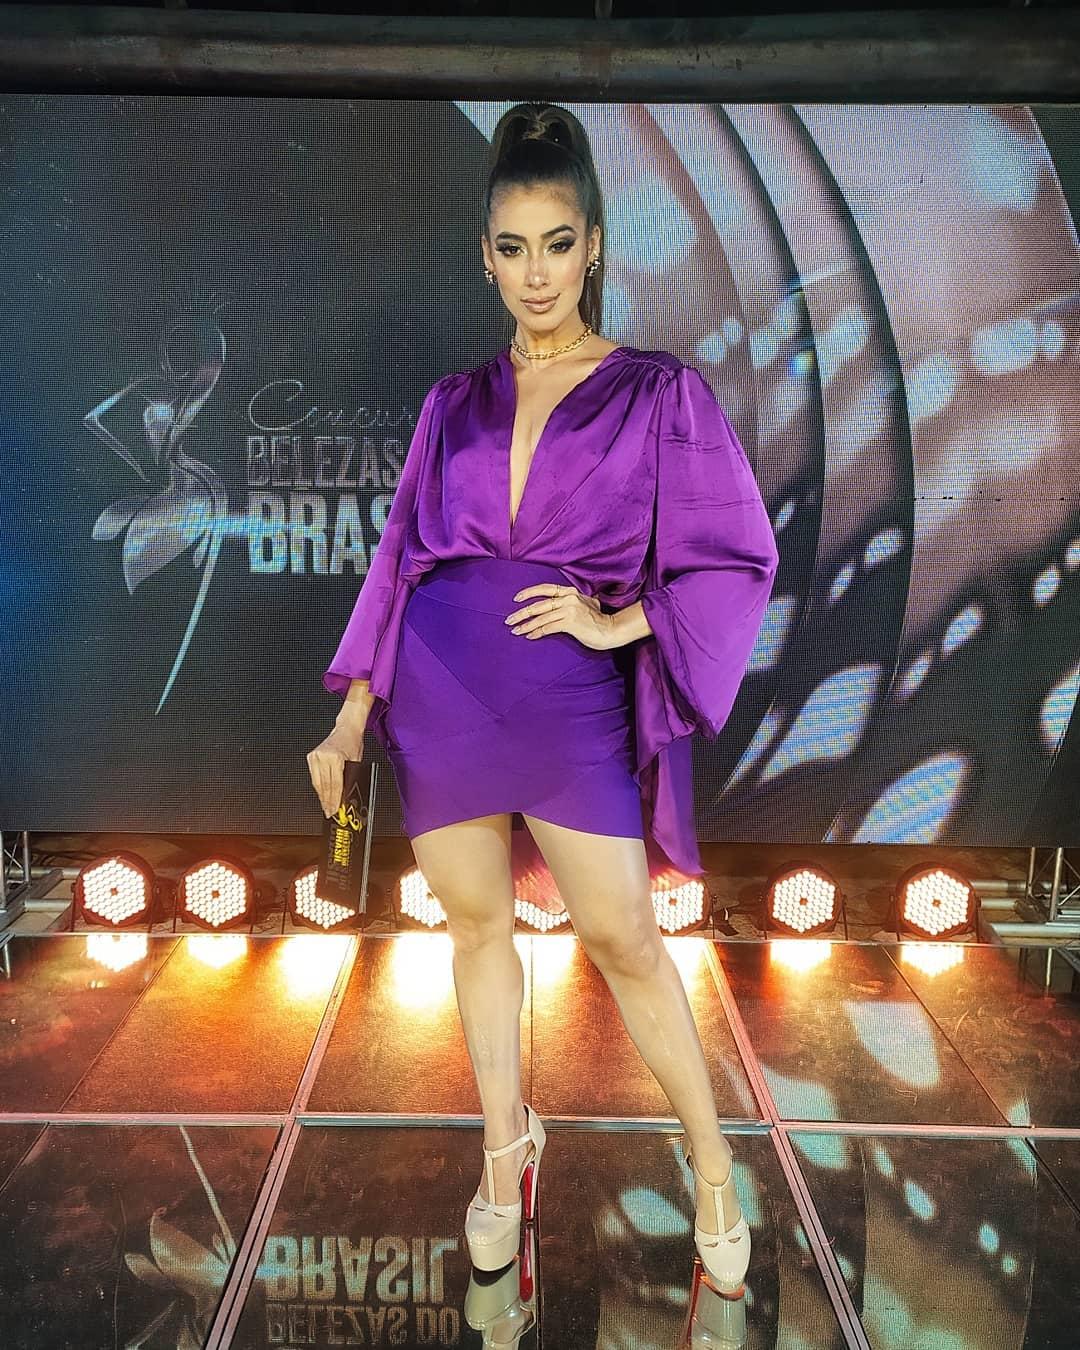 natalia gurgel, top model brasil 2021/miss morada nova 2019/miss sertao central empresarial 2018/top 20 de miss asia pacific international 2018, representando o uruguai. - Página 5 21373111